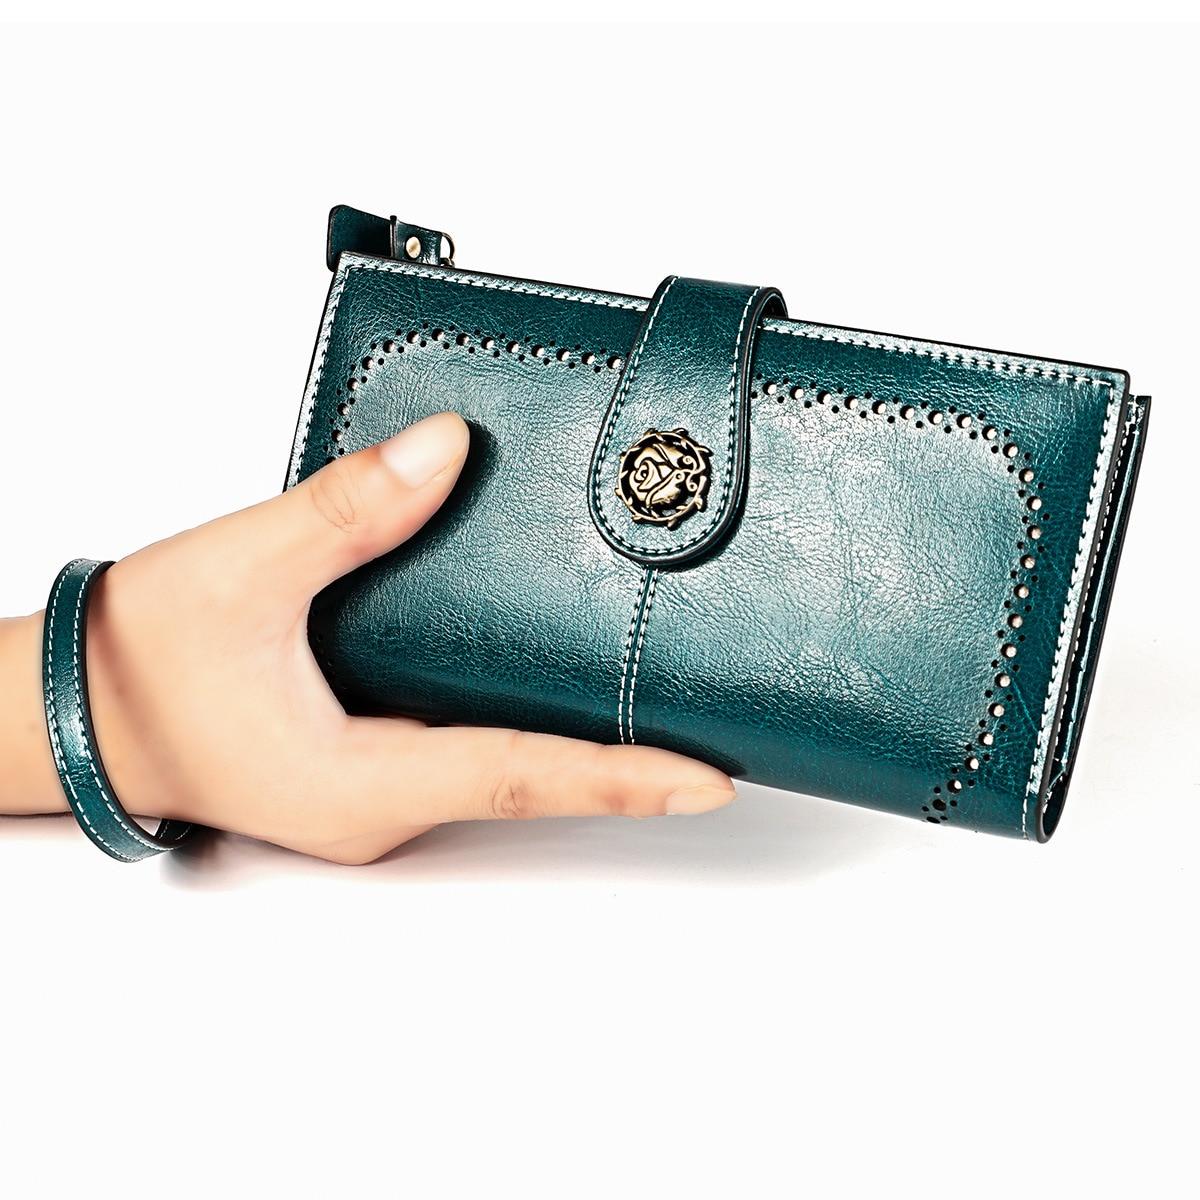 Fashion Women Wallets Long Split Leather Female Clutch Purse Large Capacity Card Holder Phone Wallet